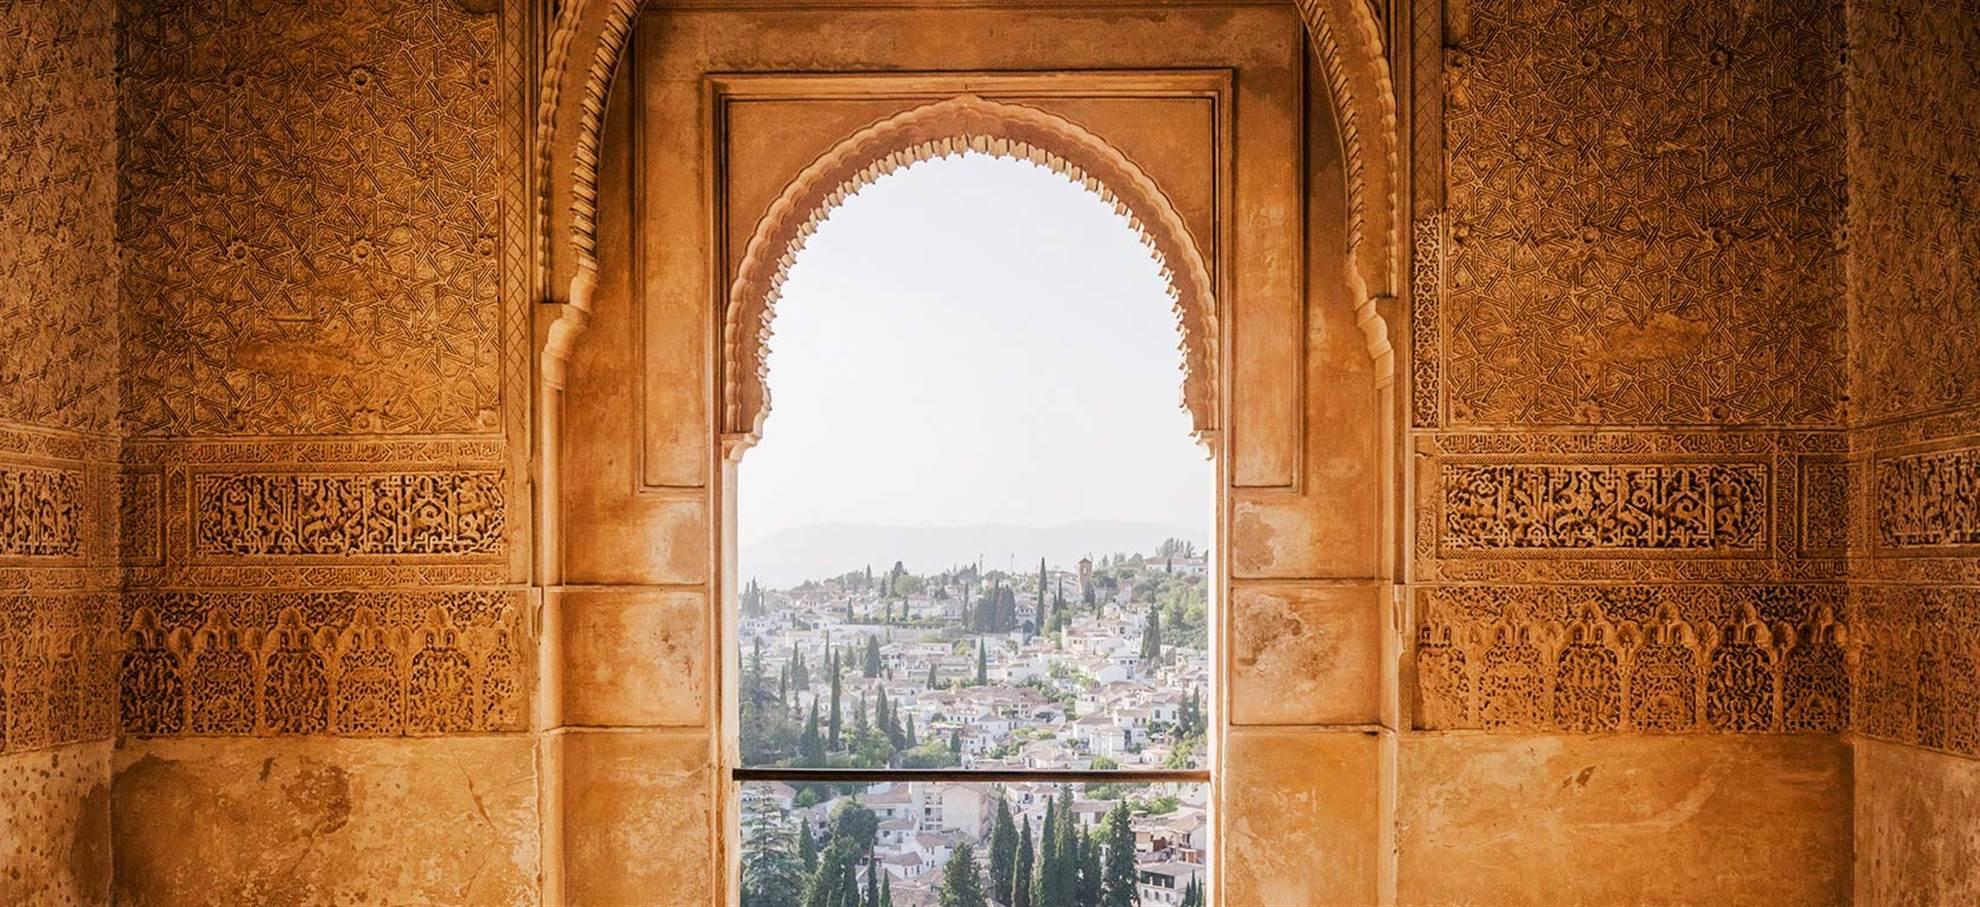 Alhambra Card - Visita pela manhã (08h30) - Salta la fila